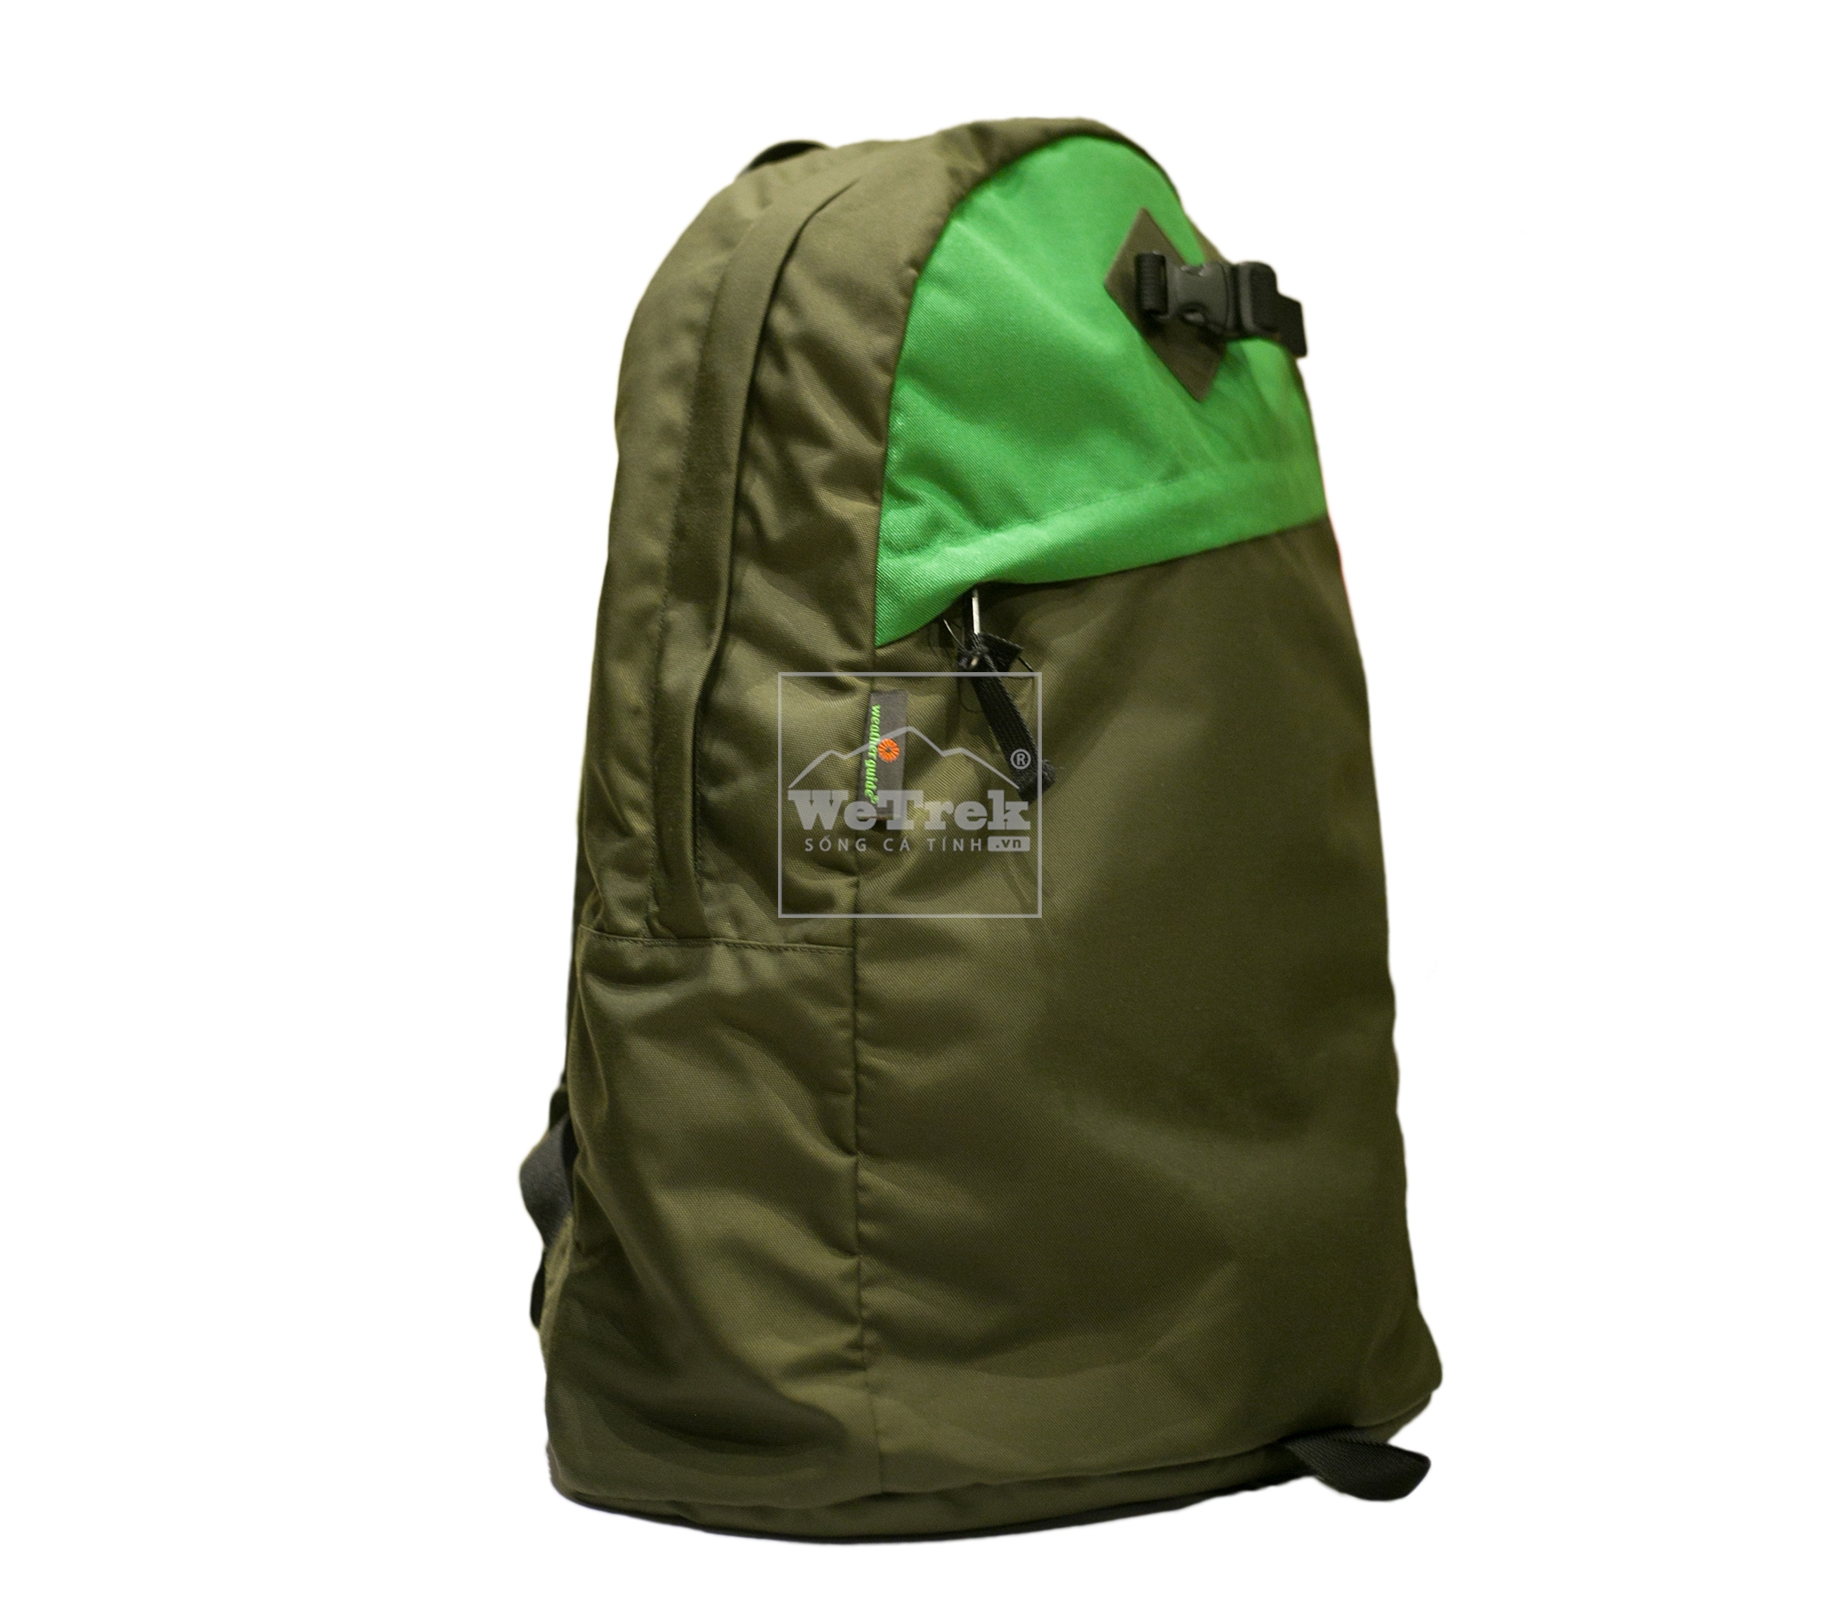 4-balo-du-lich-chong-nuoc-Weather-Guide-Waterproof-Backpack-CA-0127-8352-wetrekvn.jpg